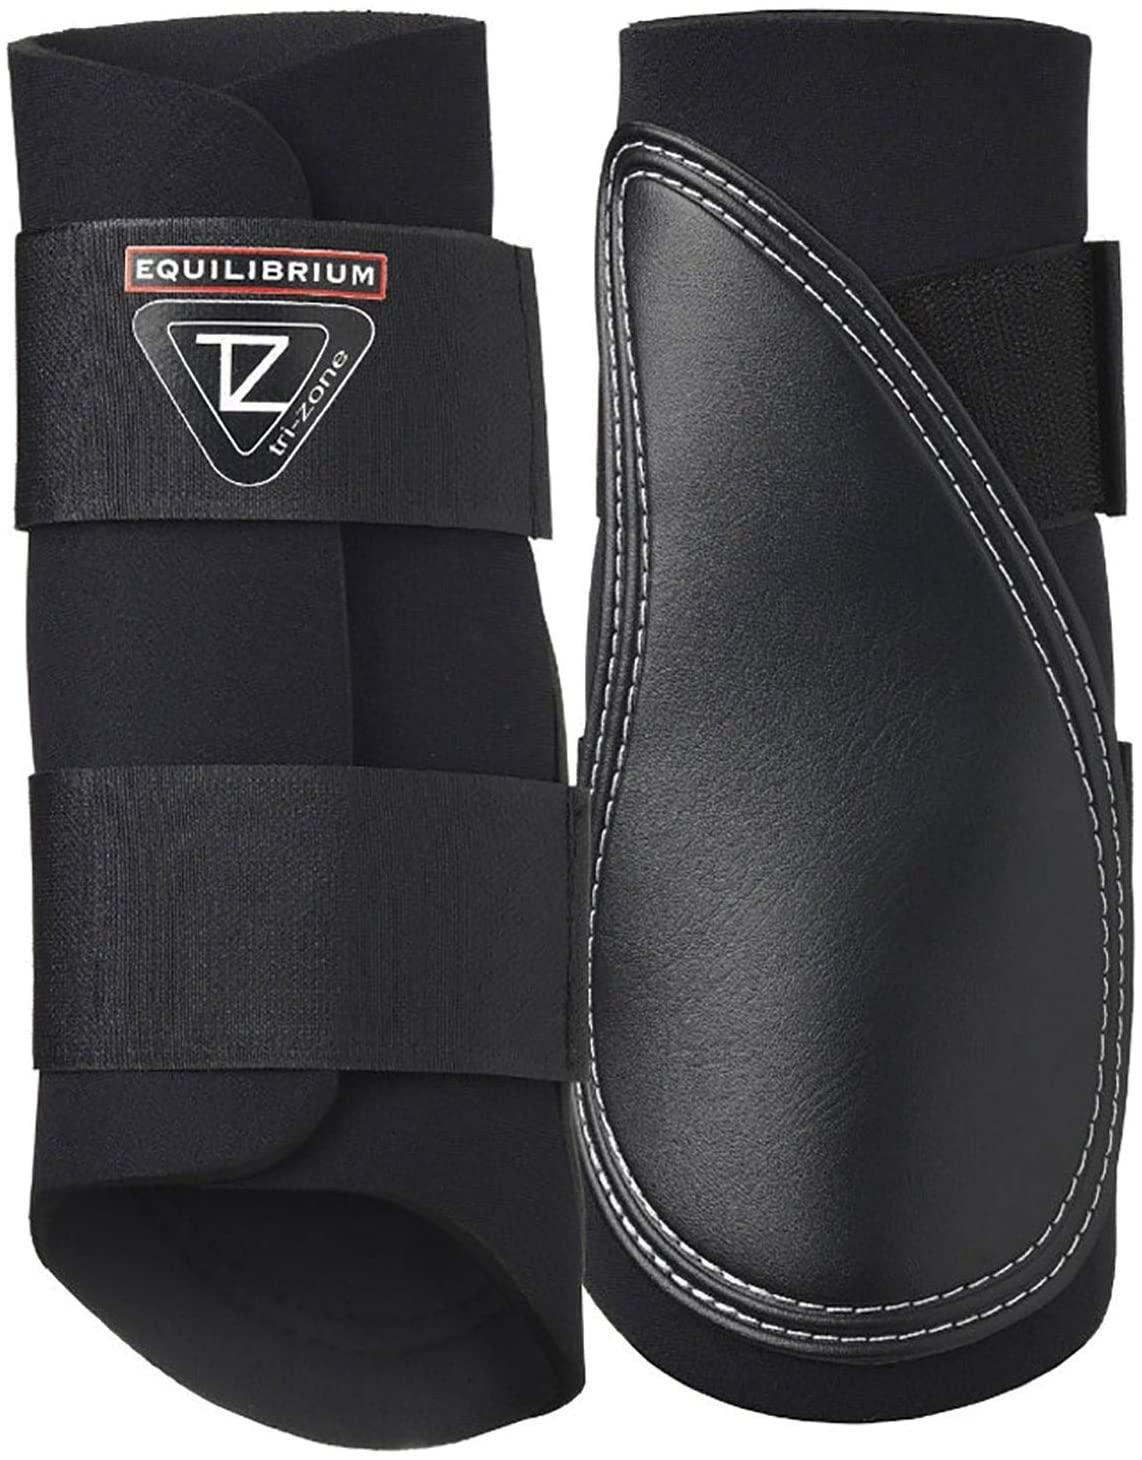 Equilibrium New Tri-Zone Brushing Boot X Small Black